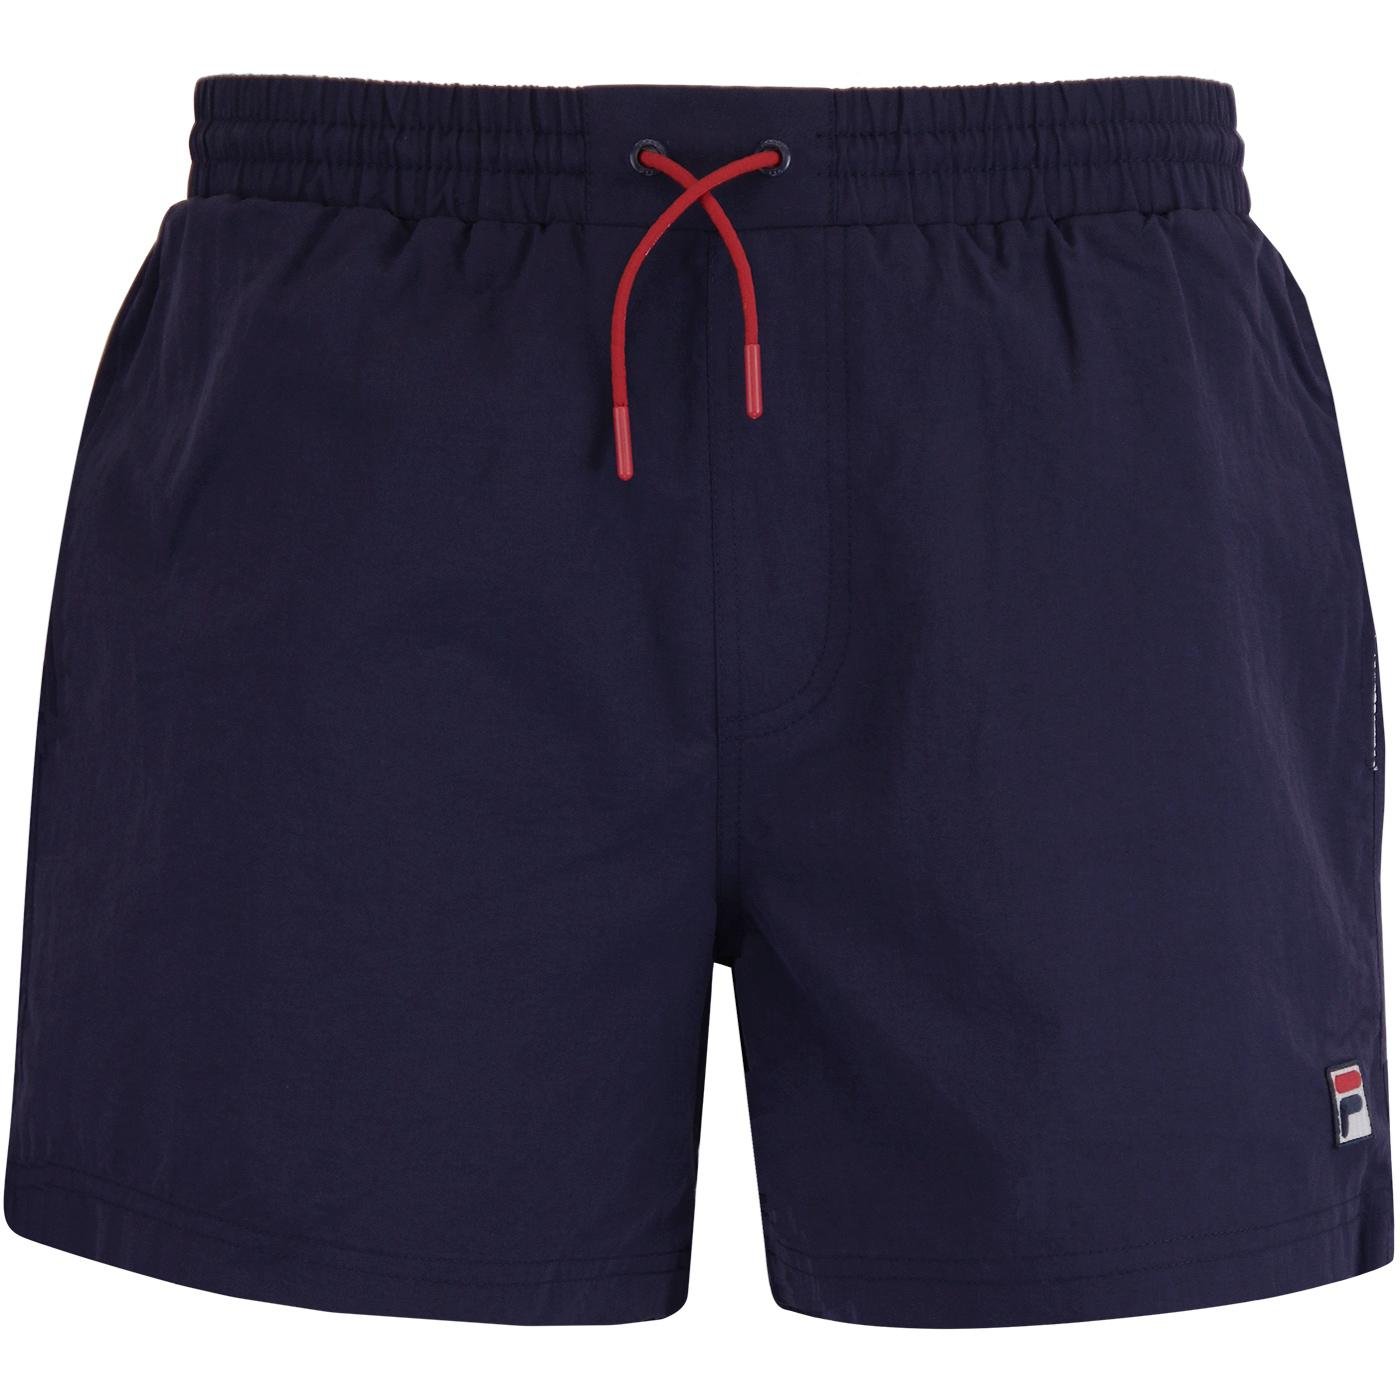 Martin FILA VINTAGE Retro 80s Basic Swim Shorts